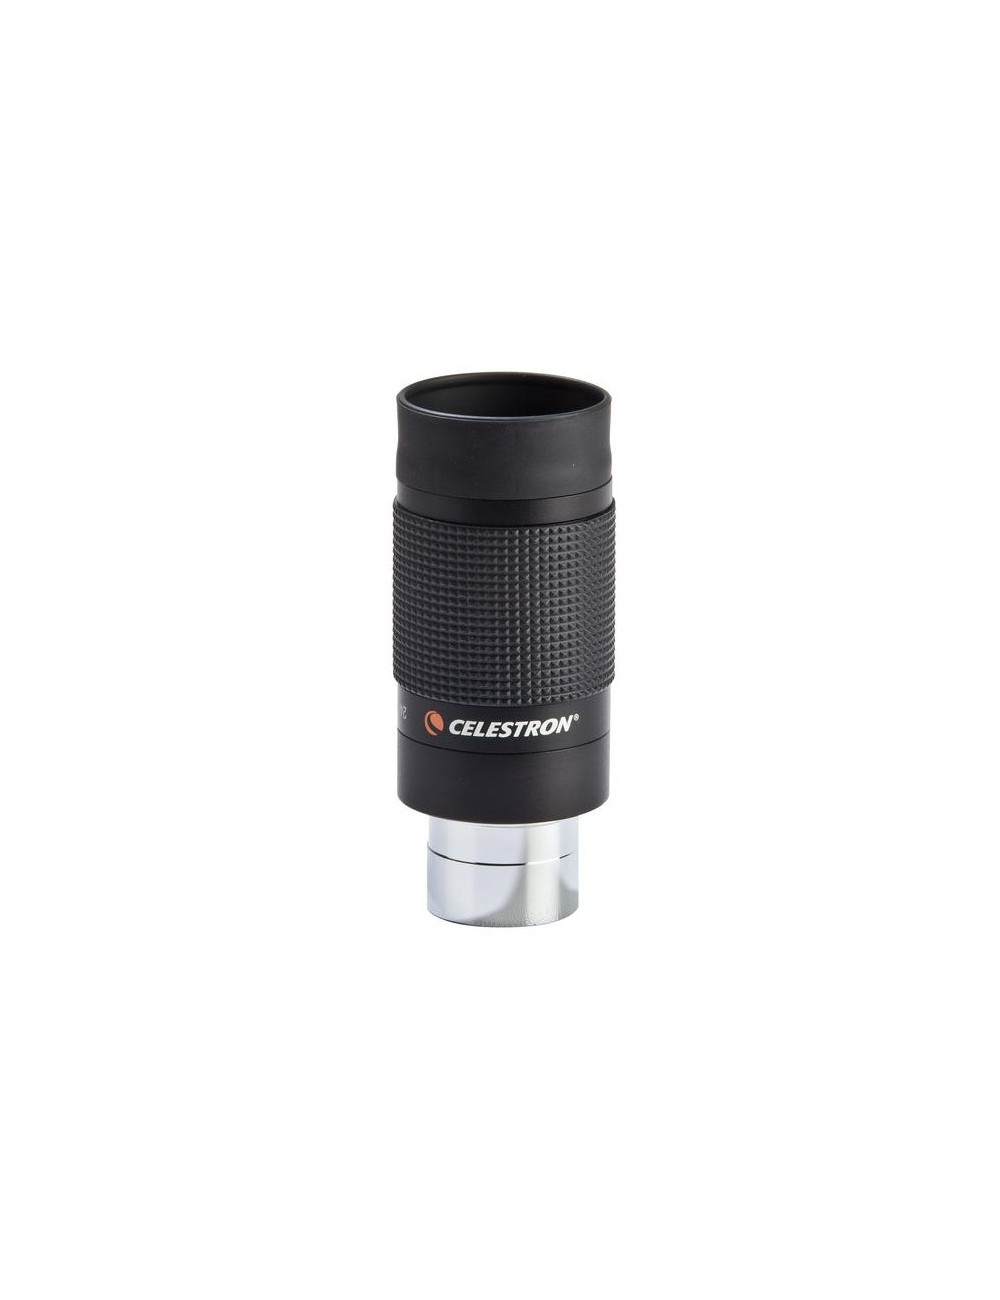 Oculaire zoom 8-24 mm Celestron